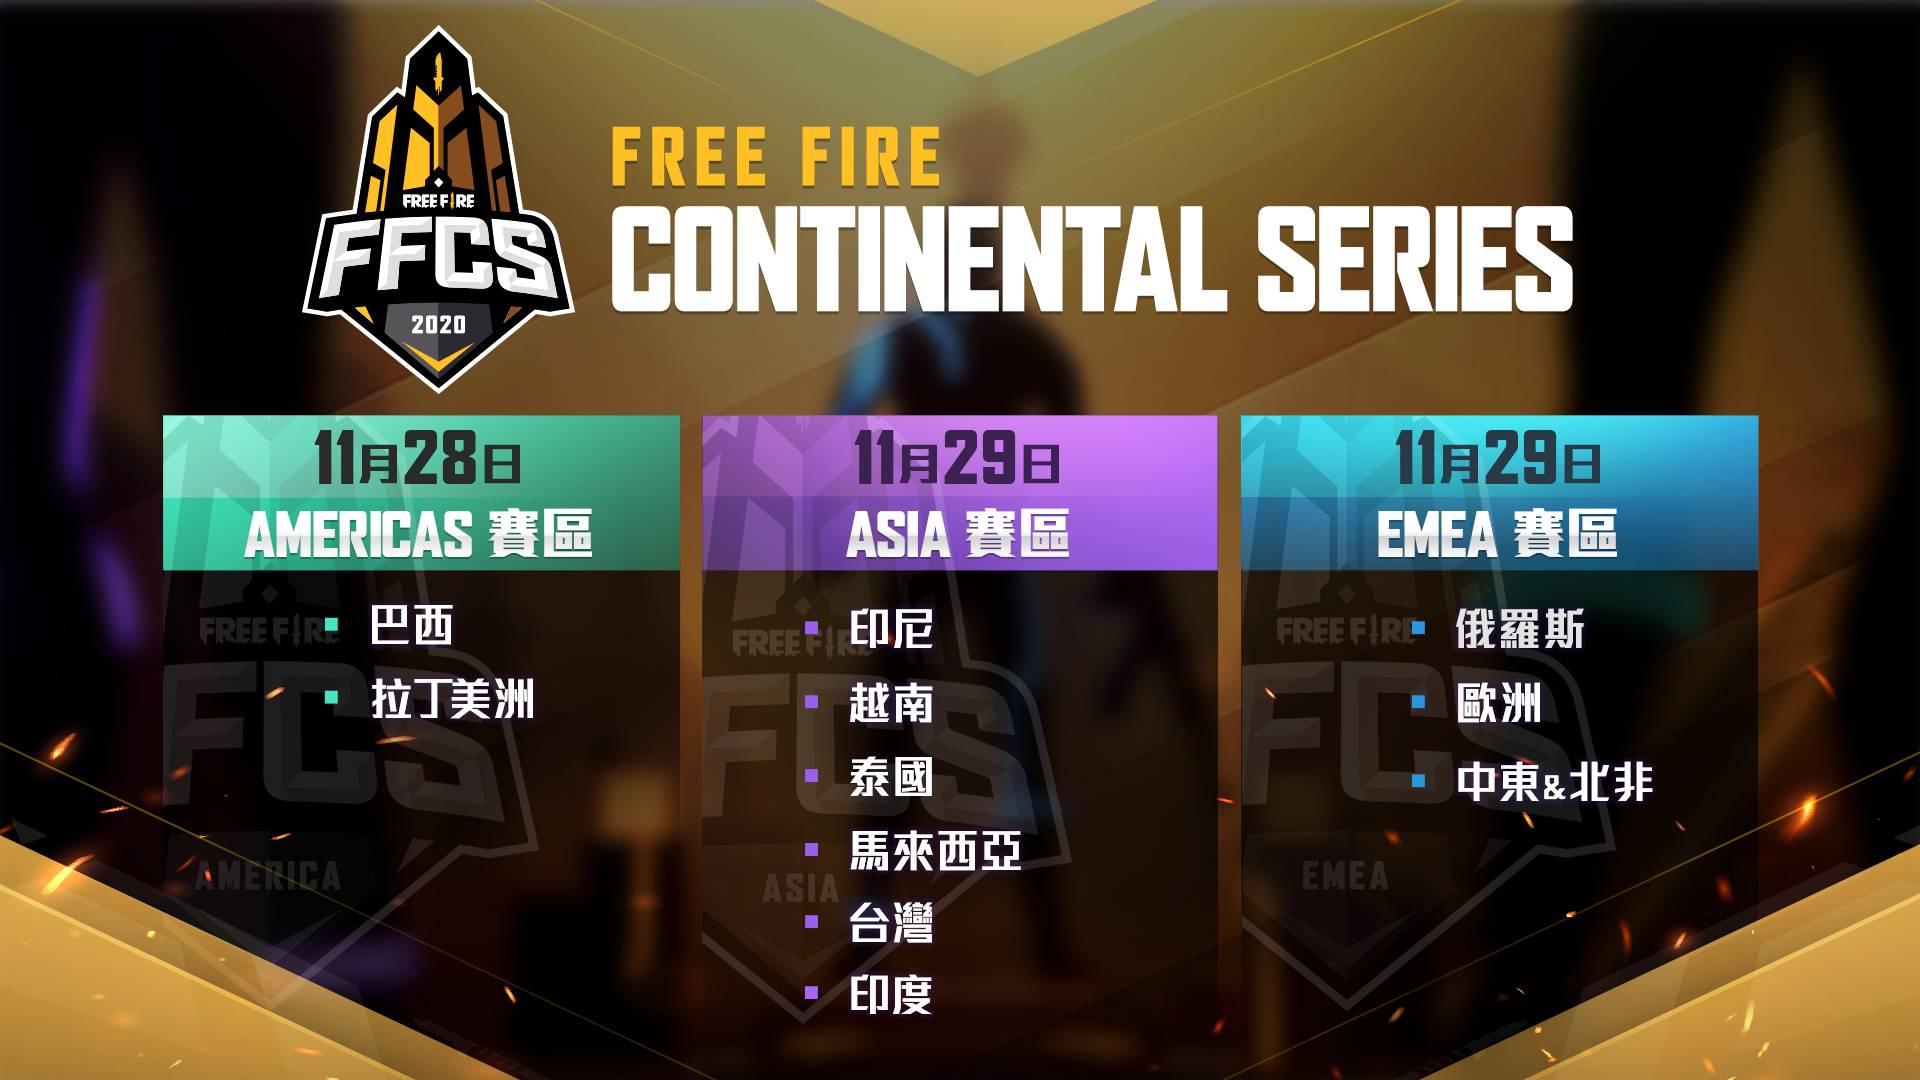 《Free Fire - 我要活下去》宣布推出 2020 大型國際賽事FFCS 賽區總獎金高達30萬美金